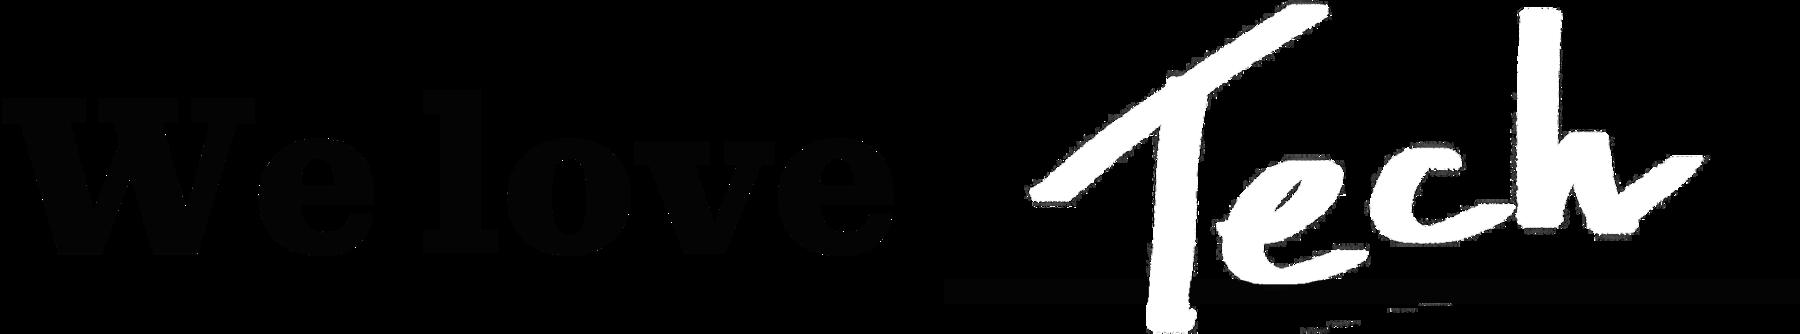 We love Tech logo